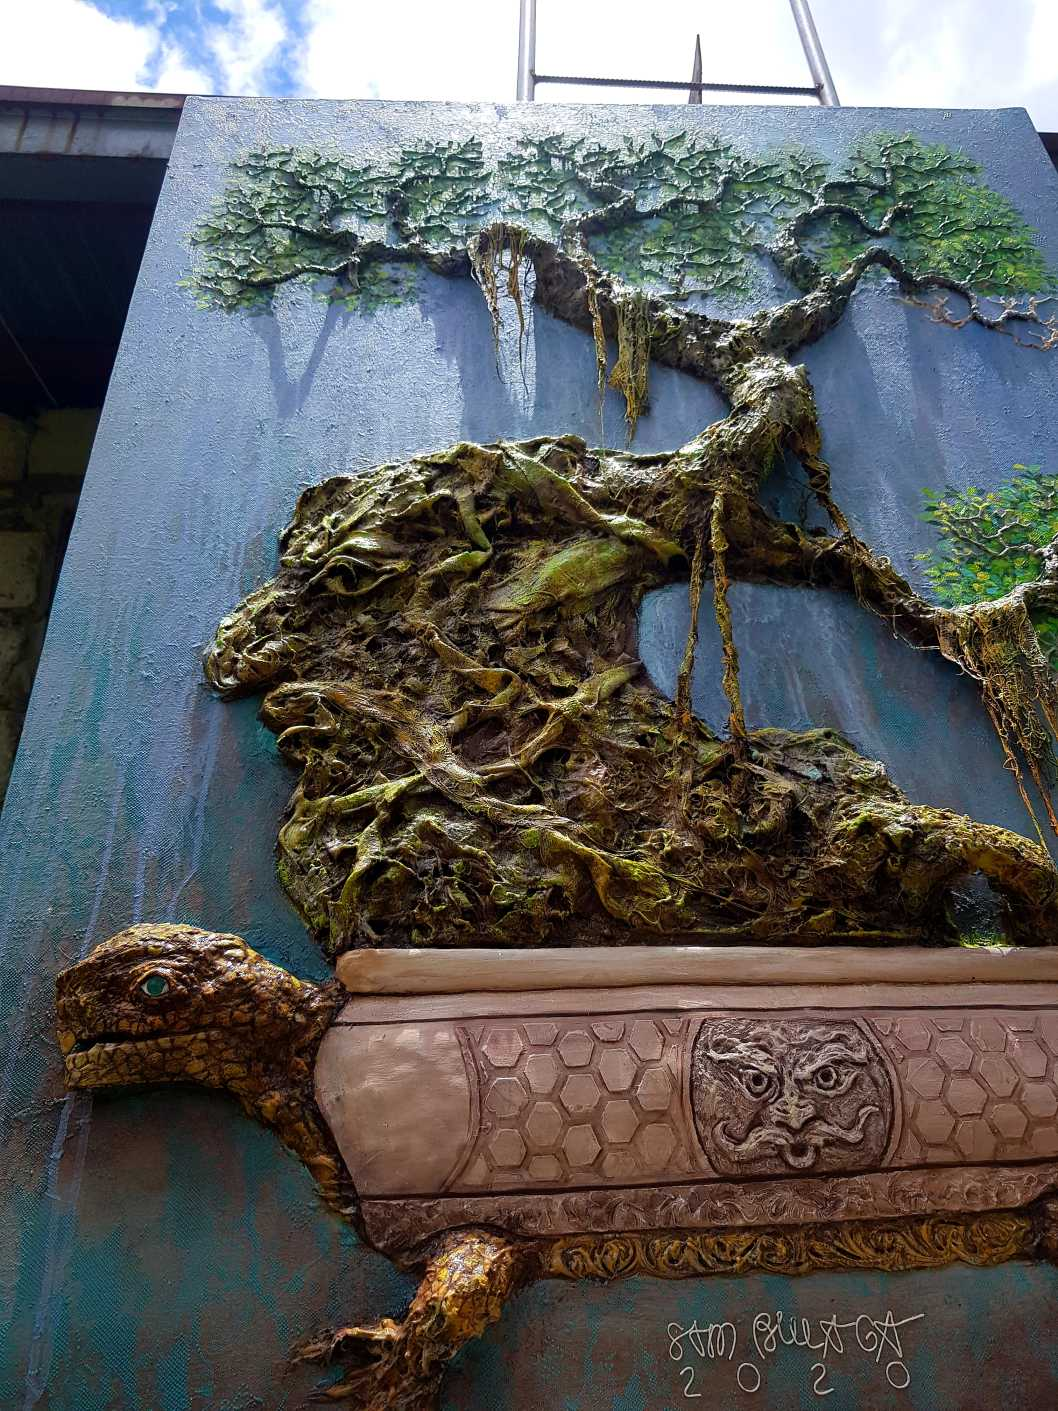 6,735 years old Ficus Bonsai tree